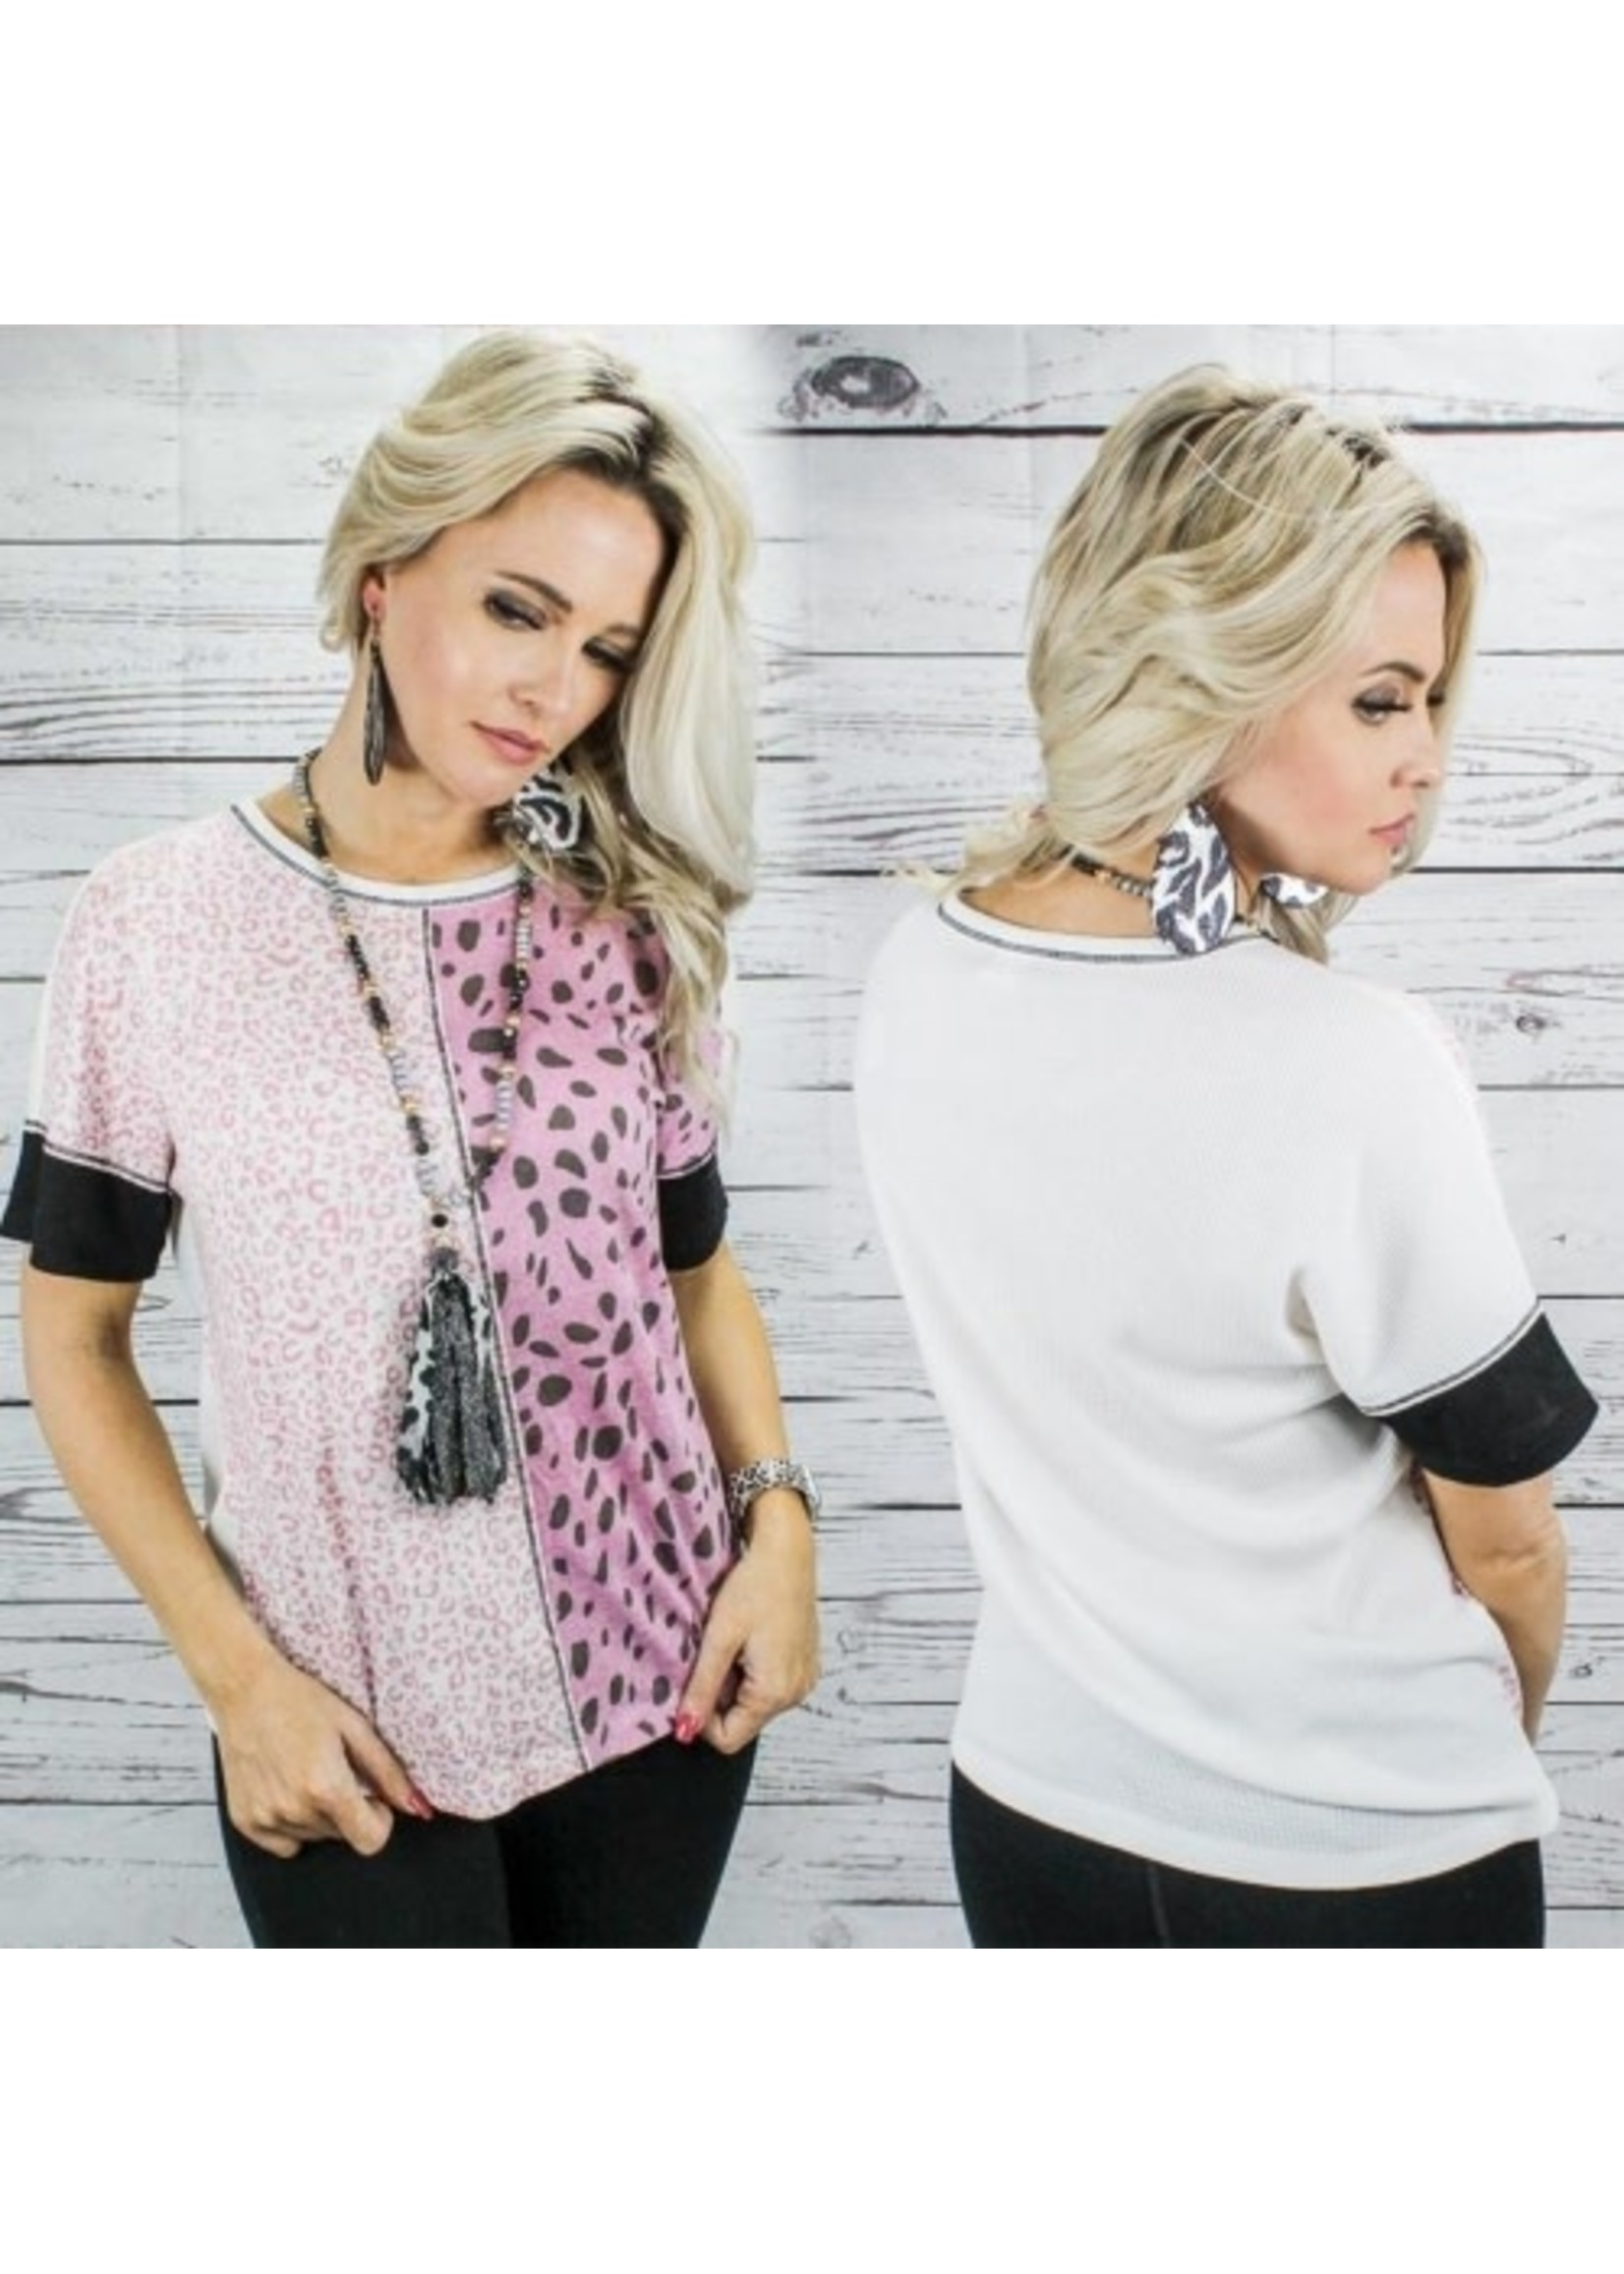 Sunshine & Rodeos Pink Leopard Top